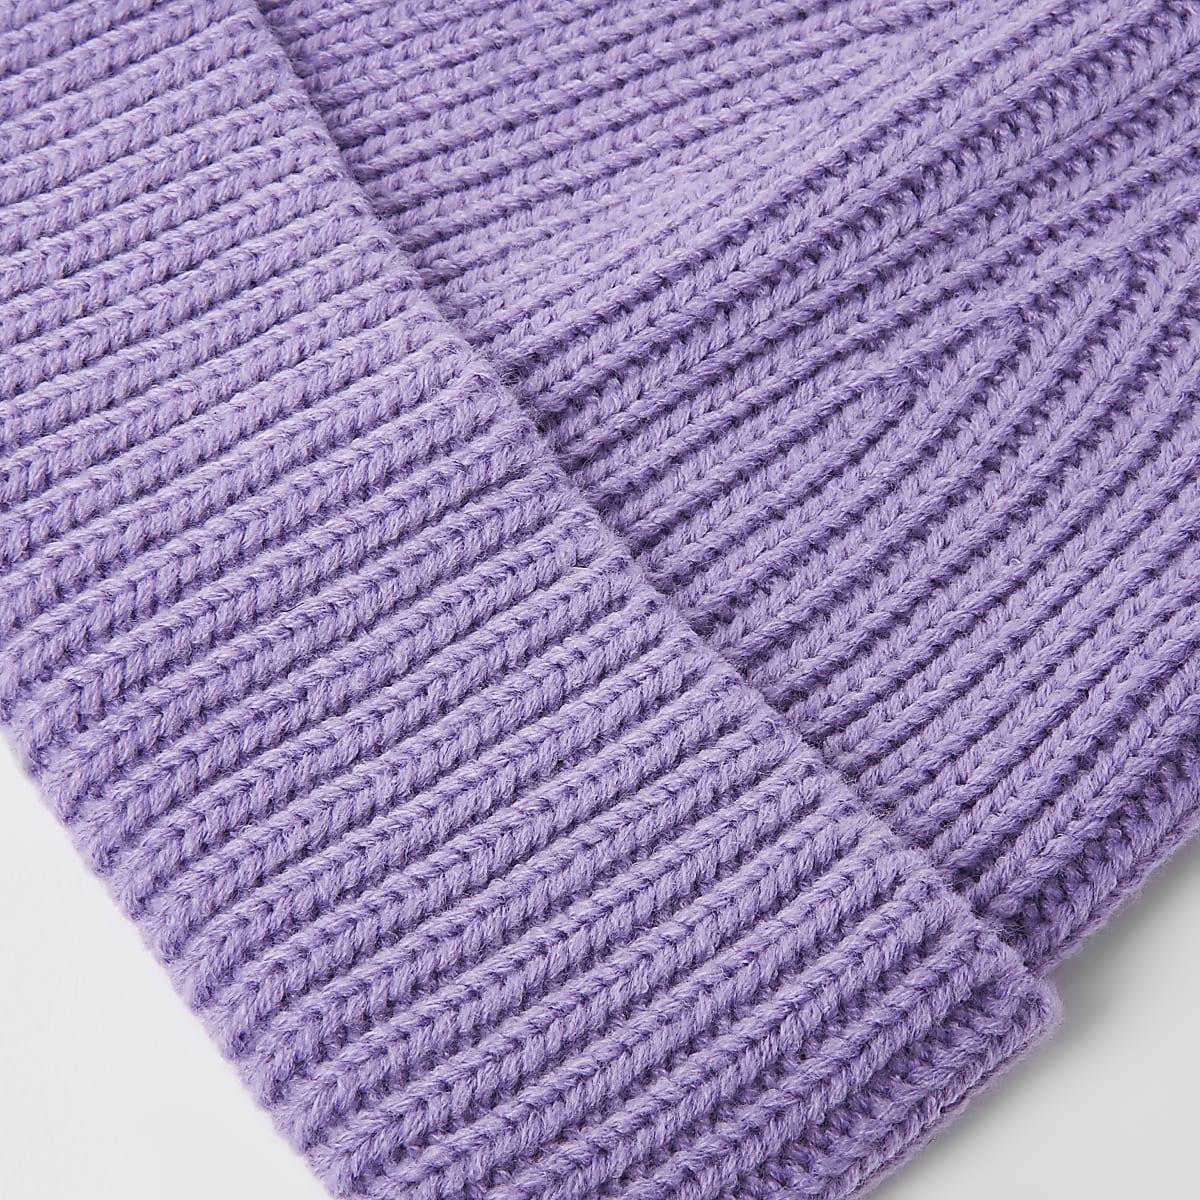 b55c8b25453 Purple fisherman beanie hat - Hats   Caps - Accessories - men